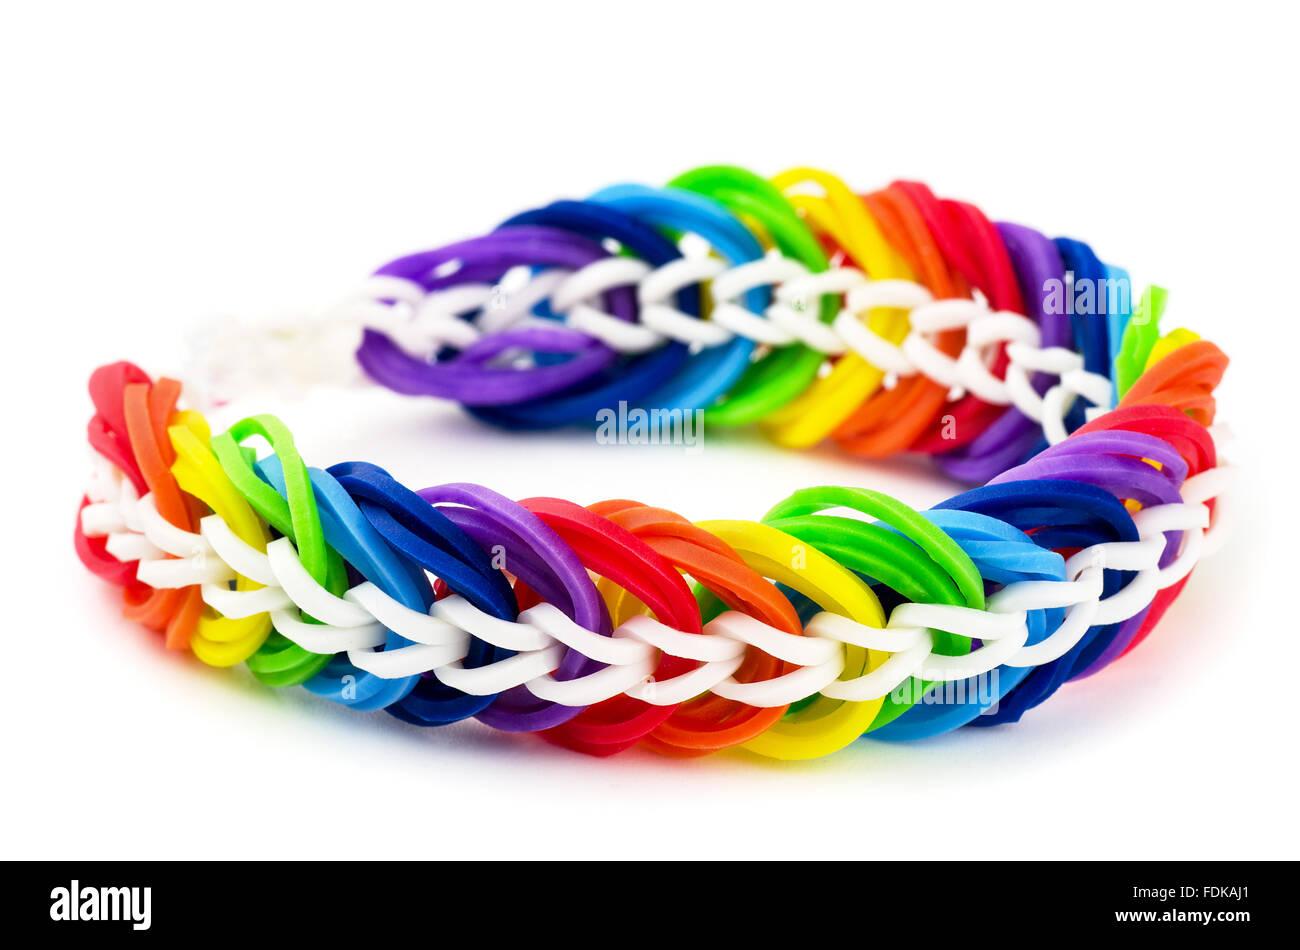 Handmade bracelet on a white background - Stock Image